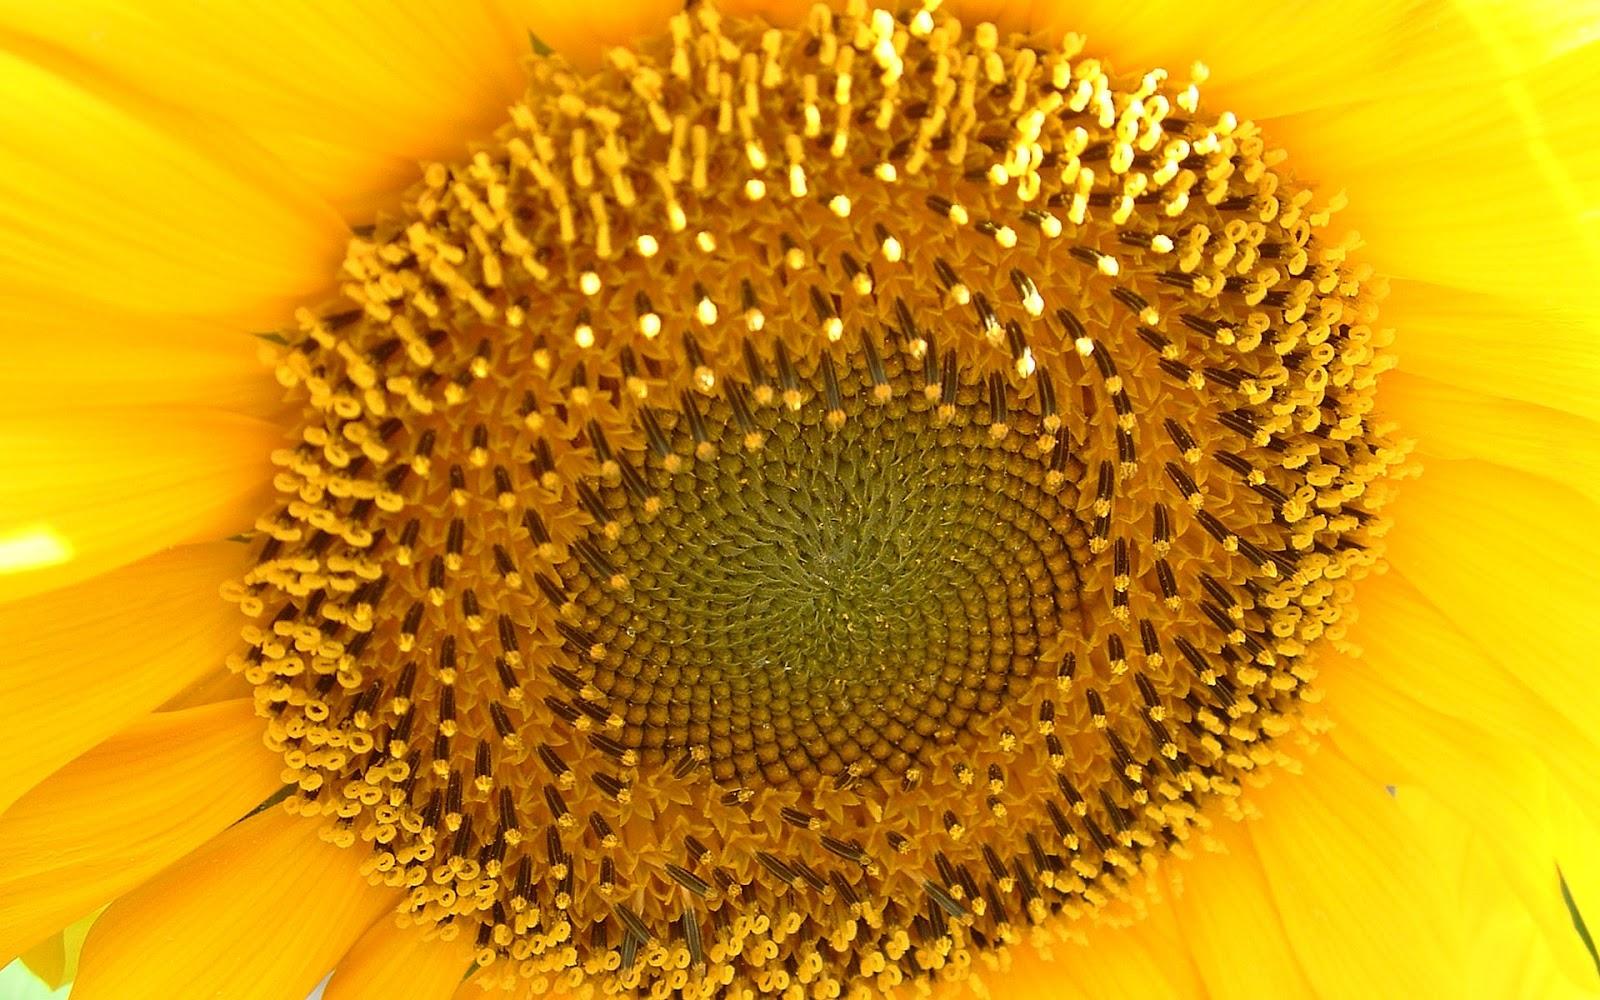 HD Sunflowers Wallpapers ~ Top Best HD Wallpapers For Desktop